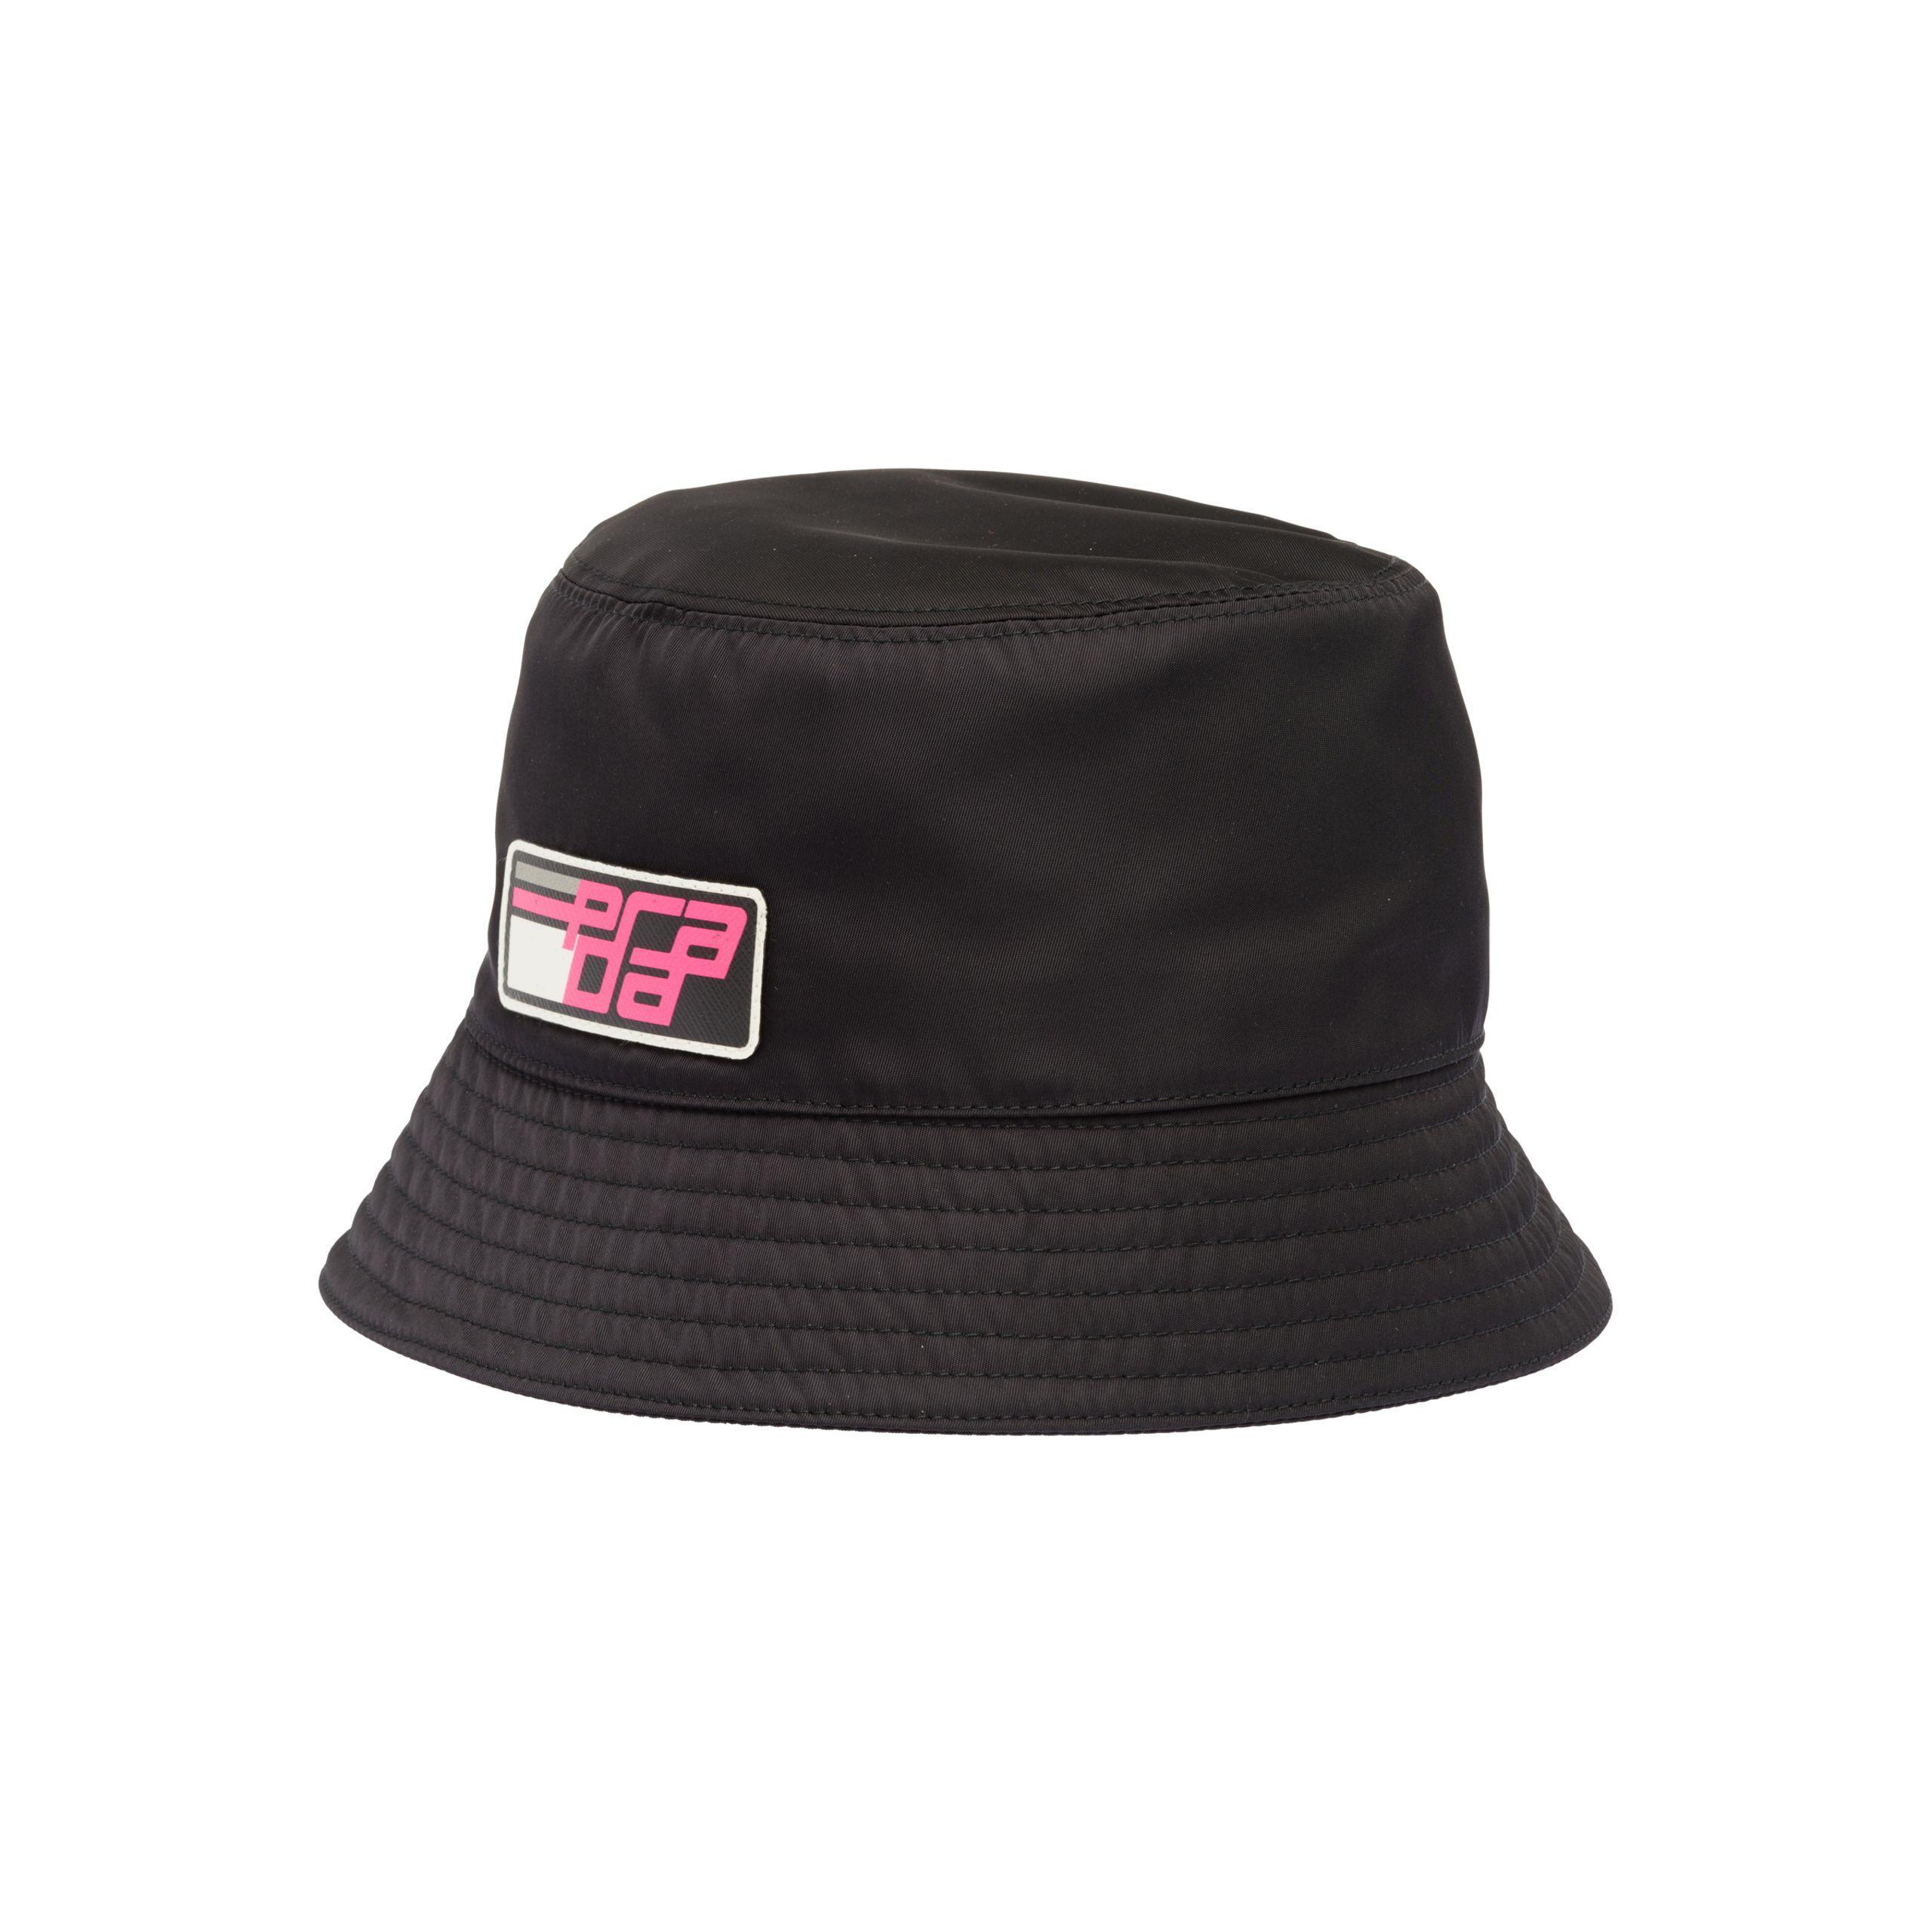 Prada - Black Nylon Cap With Logo - Lyst. View fullscreen 6720df82c2a0